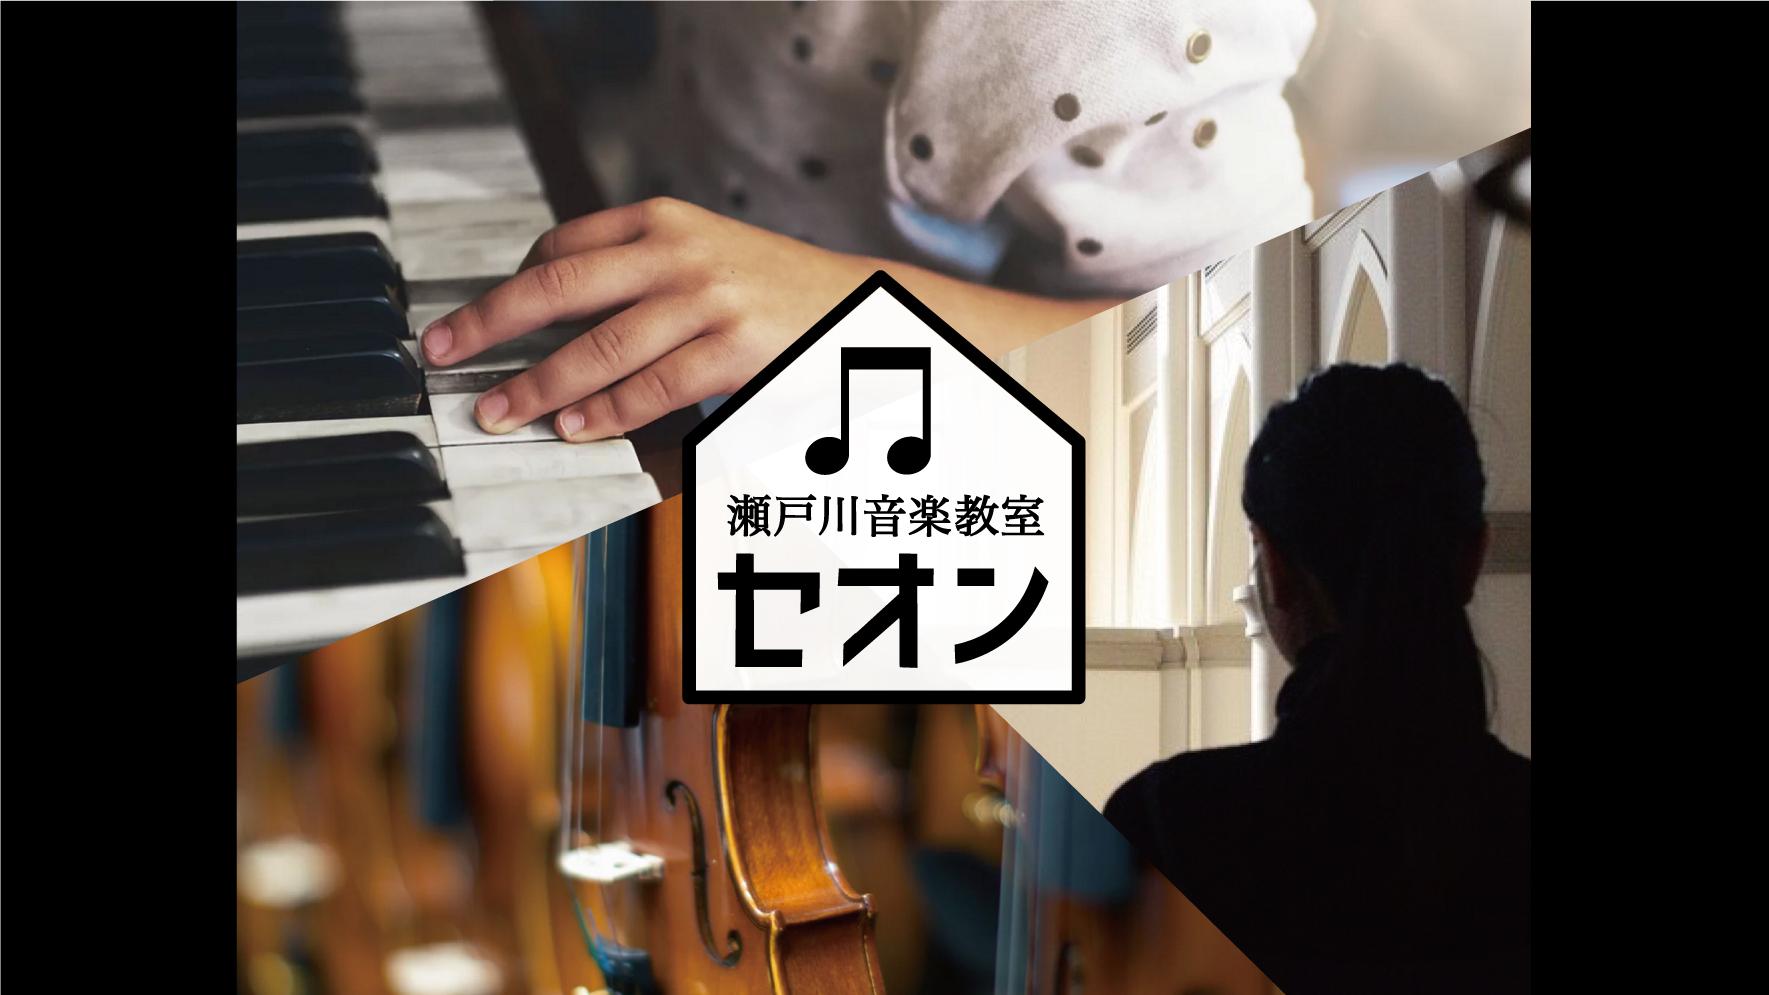 瀬戸川音楽教室セオン